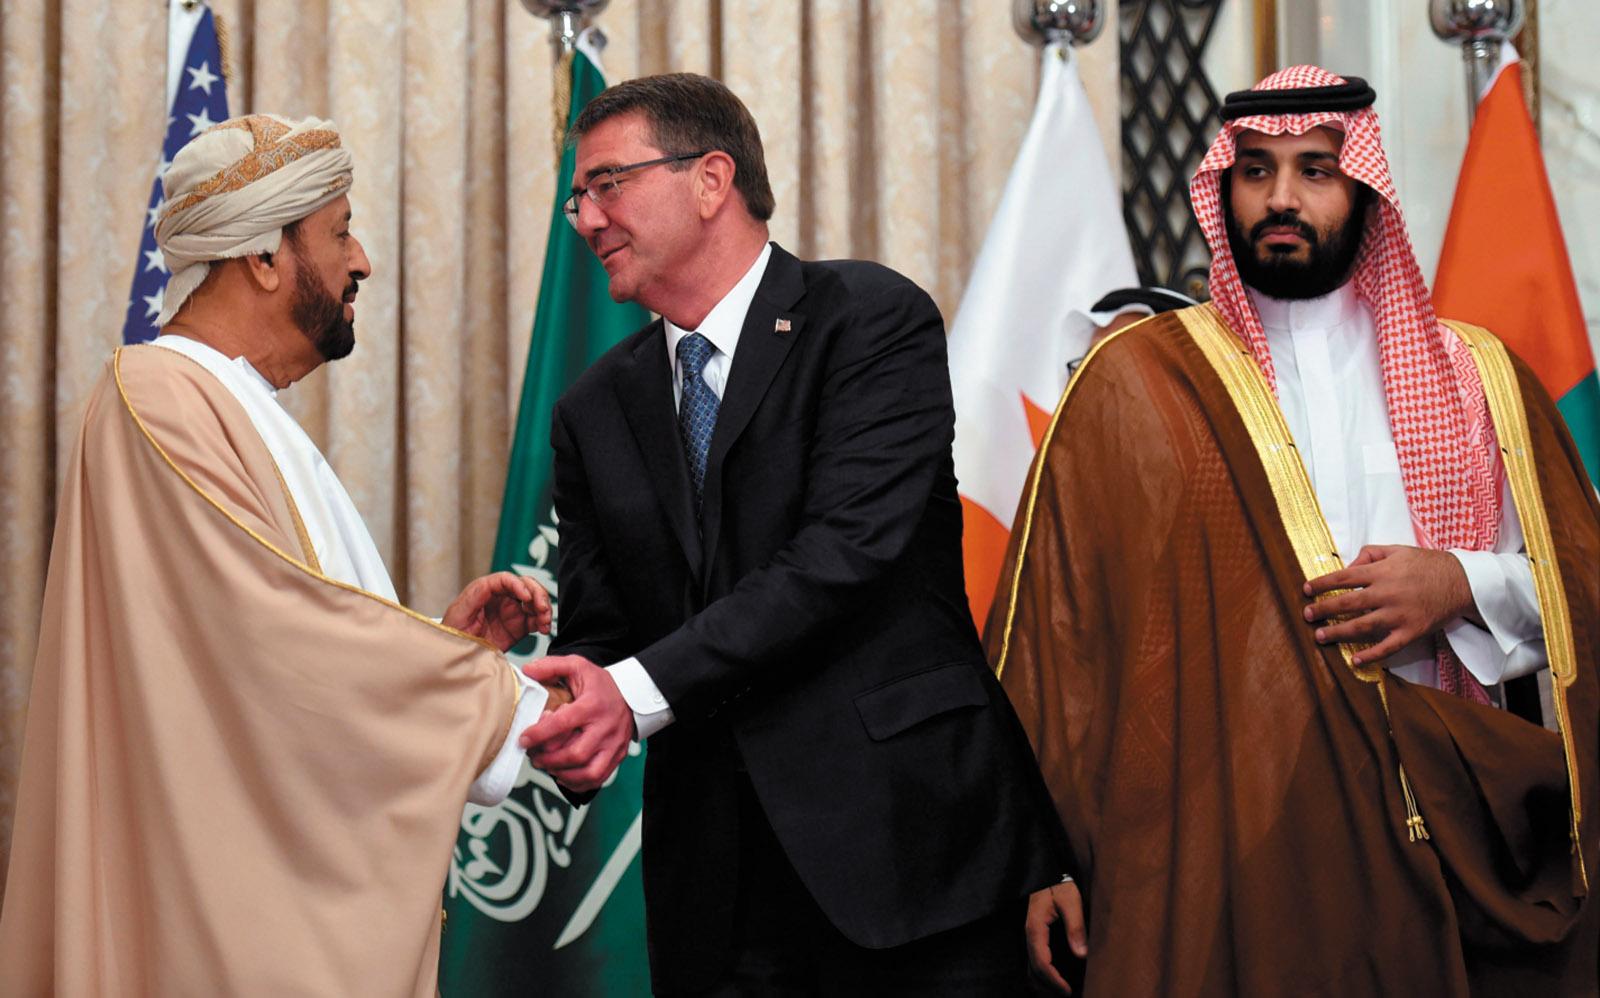 Saudi Defense Minister and Deputy Crown Prince Mohammed bin Salman, right, with Omani Defense Minister Badr bin Saud al-Busaidi and US Secretary of Defense Ashton Carter at the US–Gulf Cooperation Council summit in Riyadh, April 2016